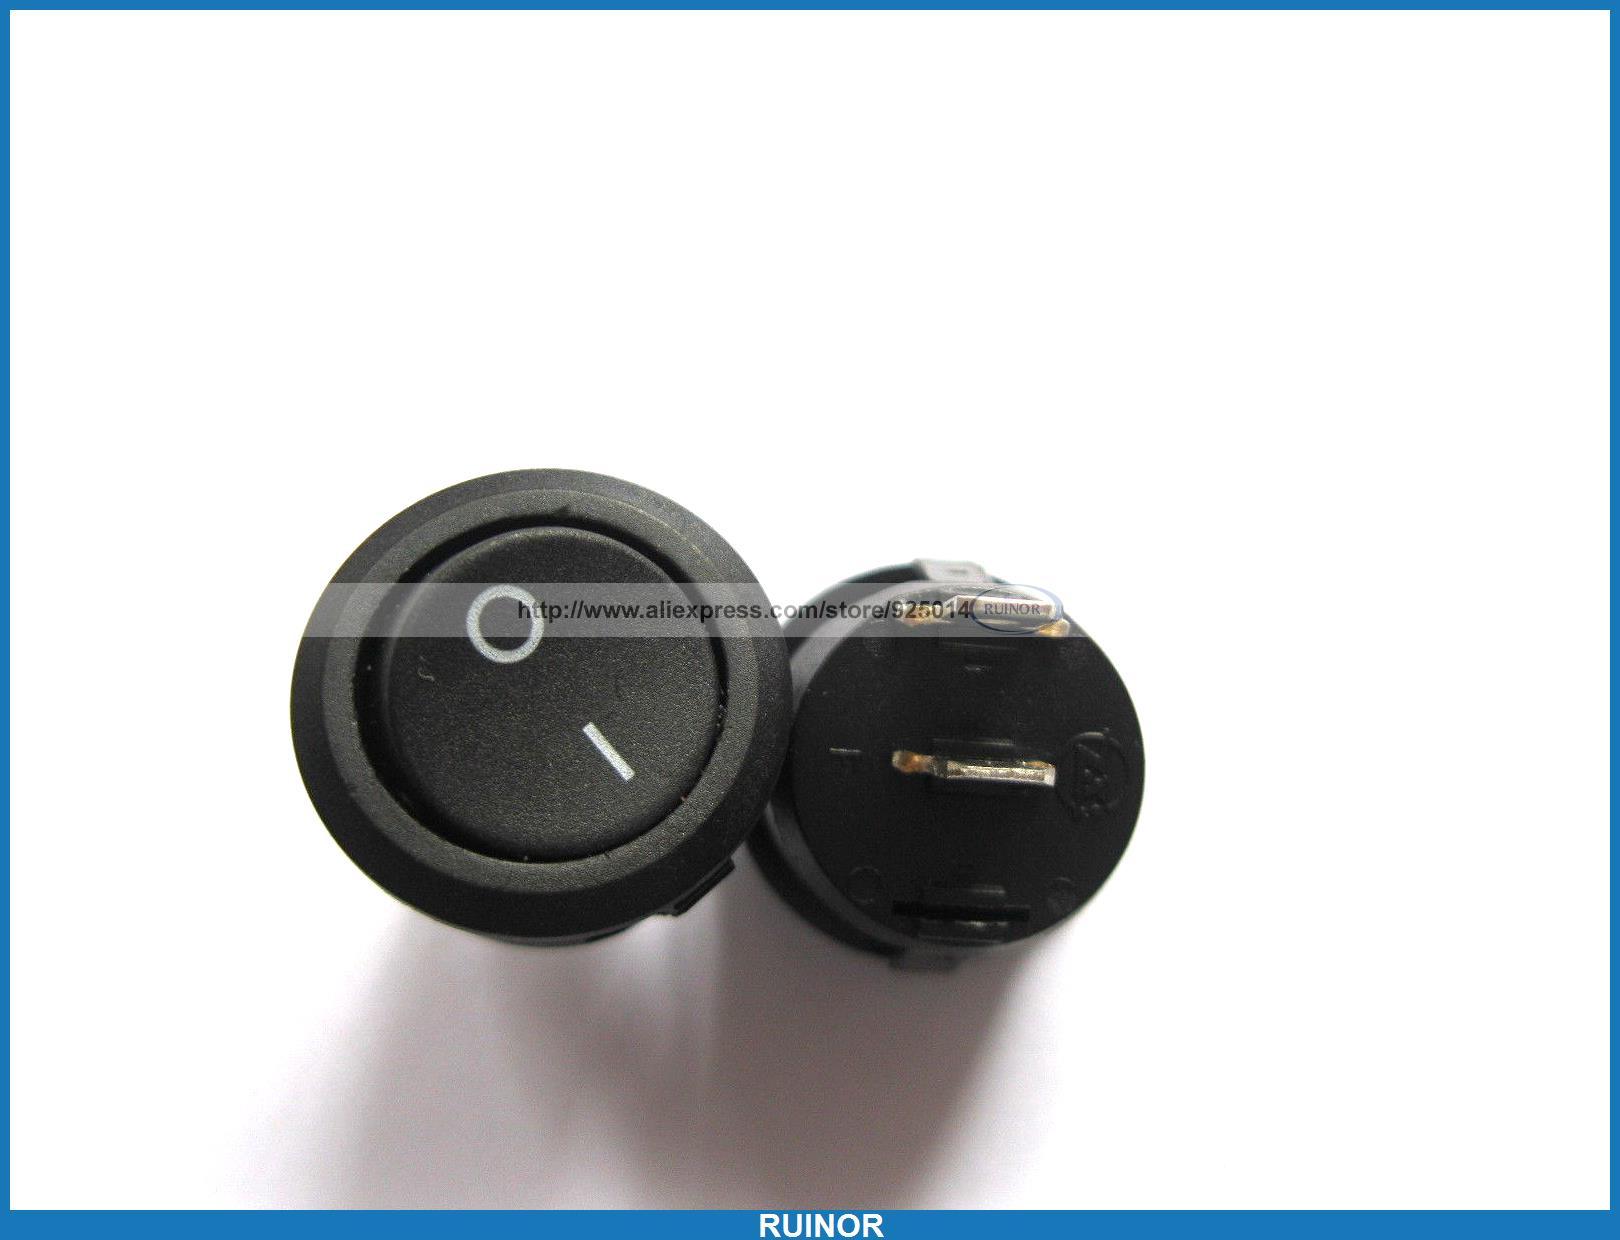 80 Pcs Rocker Switch KCD1 Circular Black 2pin 6A 10A diy rocker switch with 2 x cable for car vehicle black 3a 250v 6a 125v